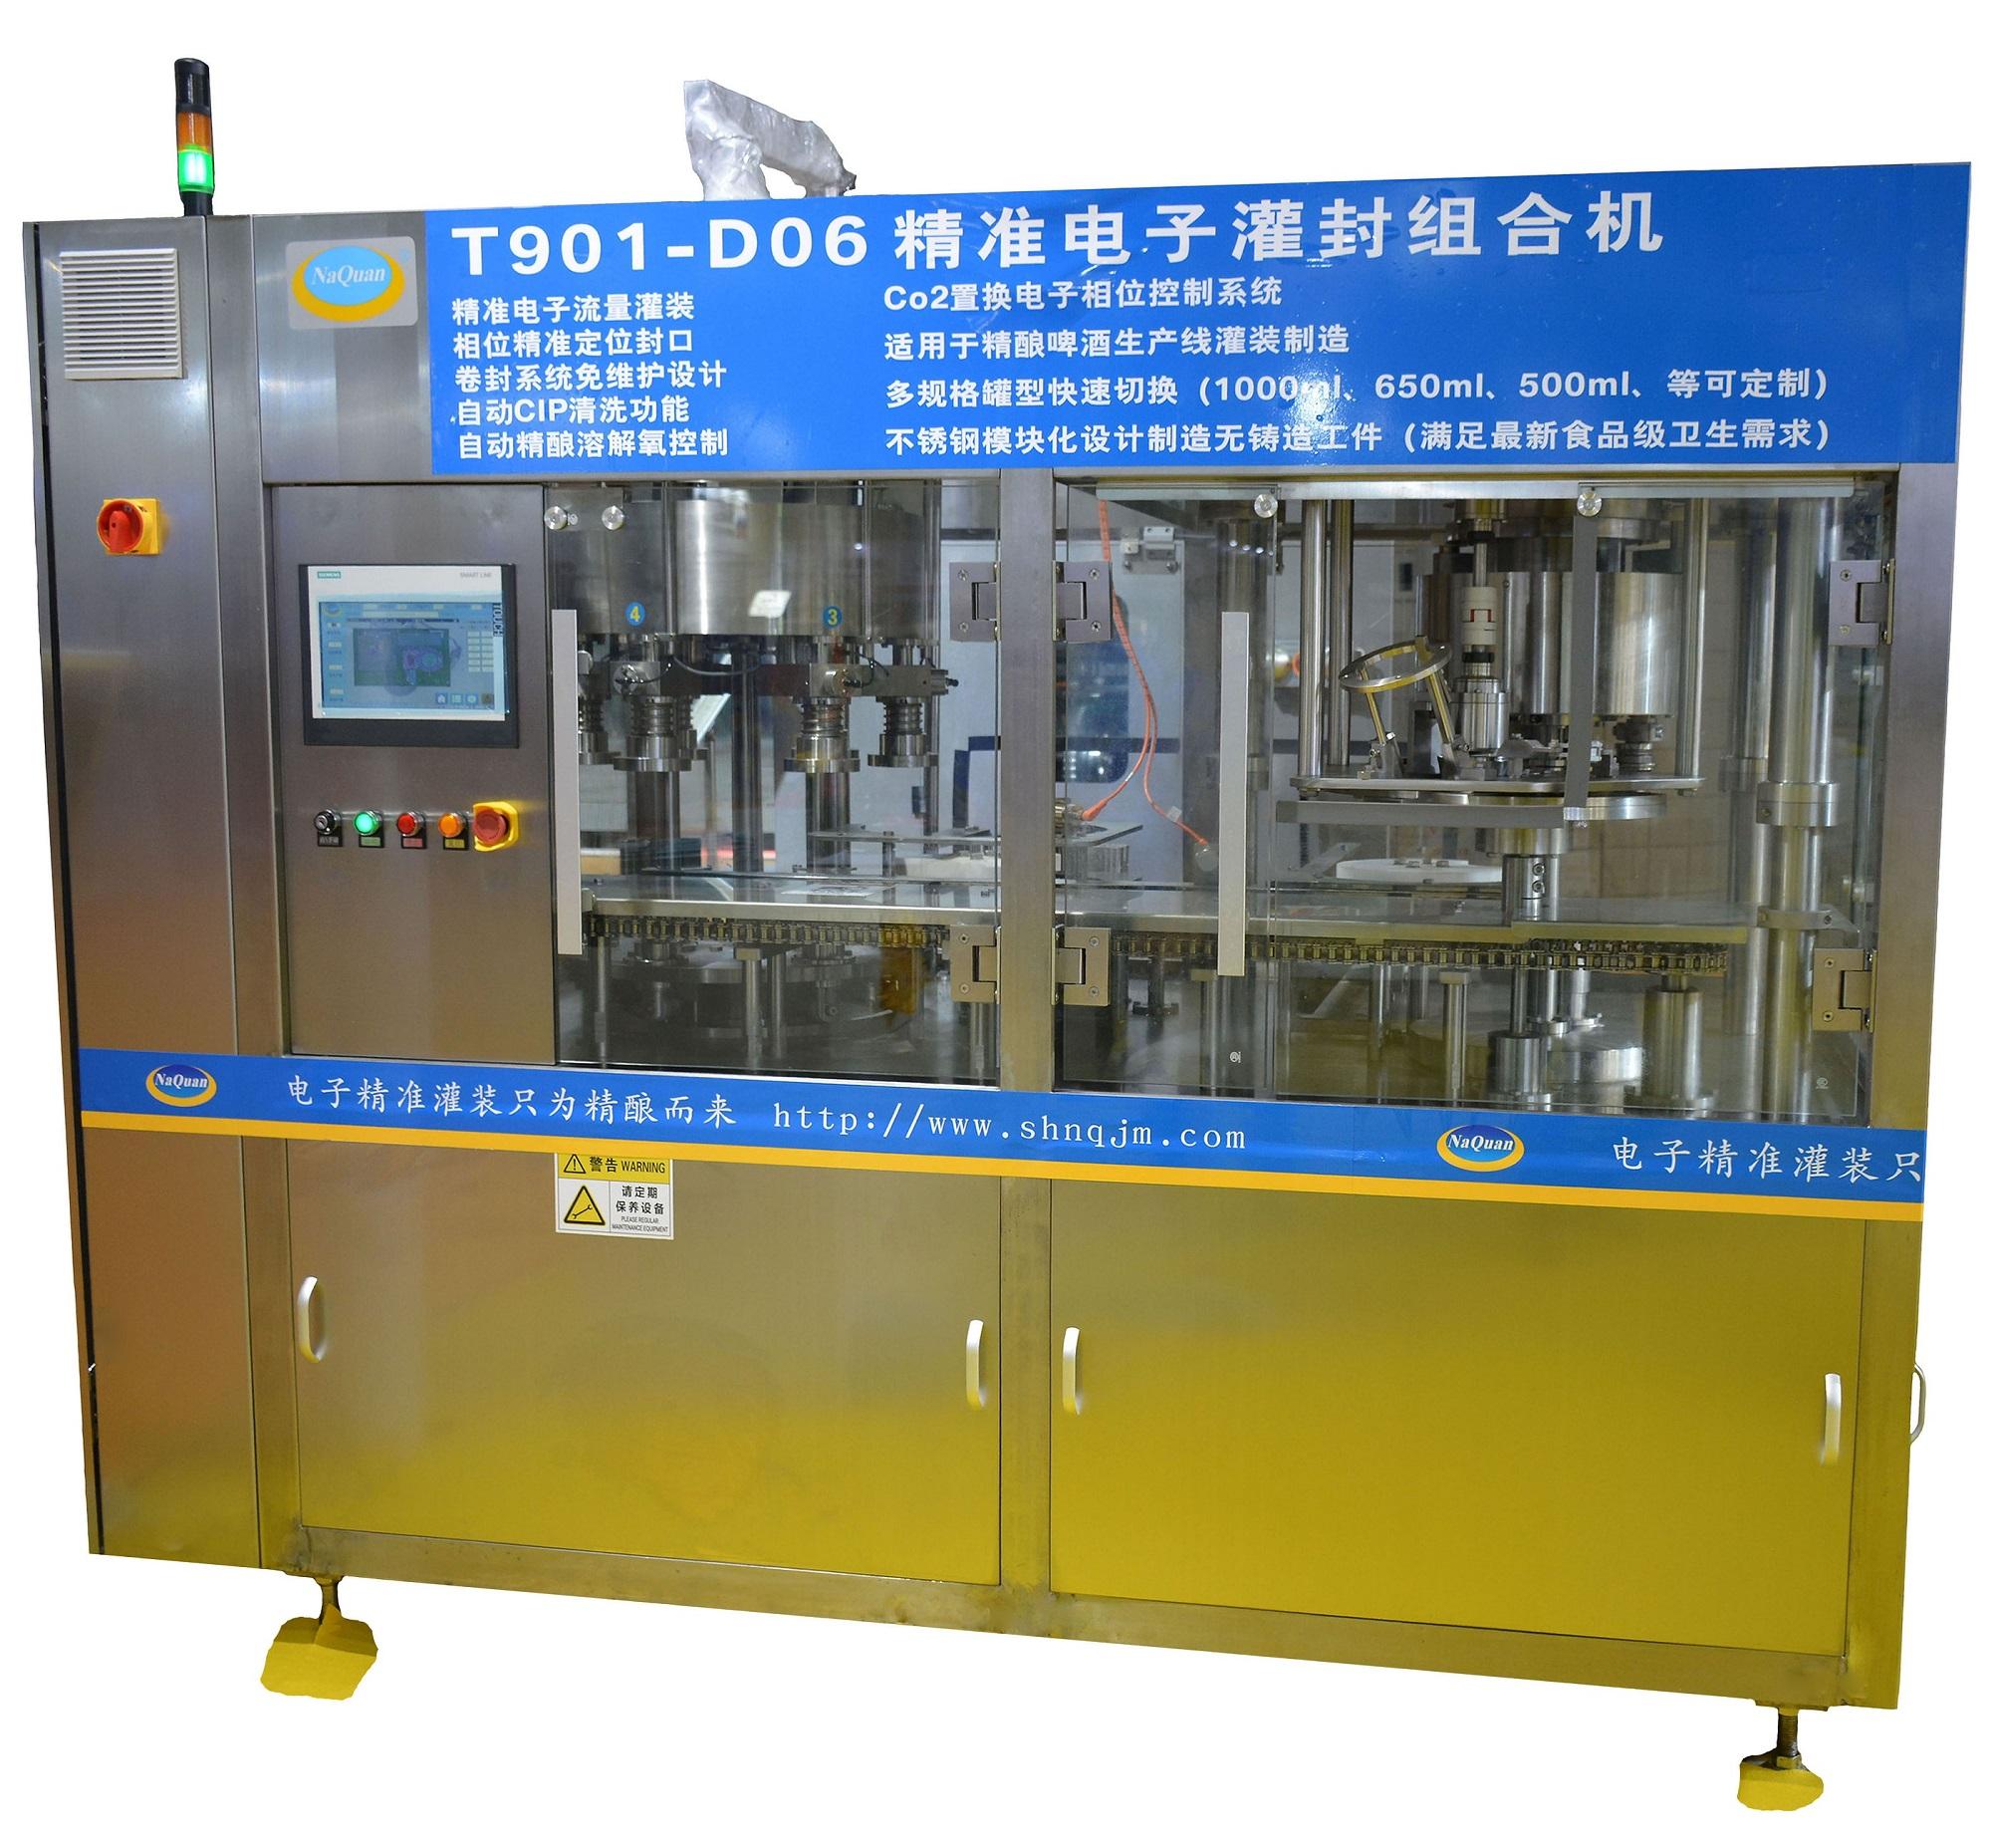 T901-D06碳酸饮料易拉罐灌装封口机